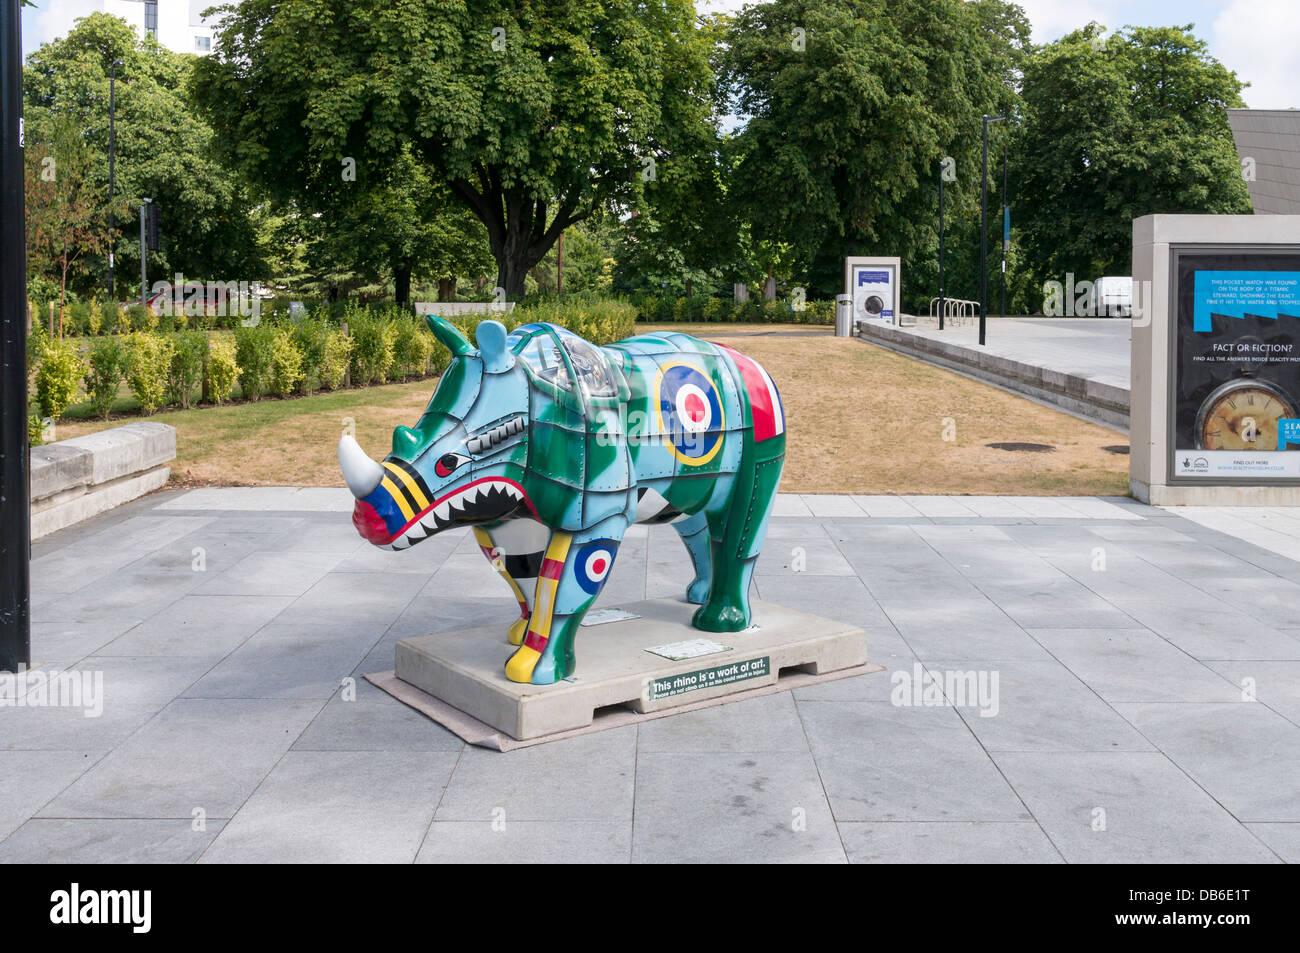 Rhinoceros Exhibit Stockfotos & Rhinoceros Exhibit Bilder - Alamy